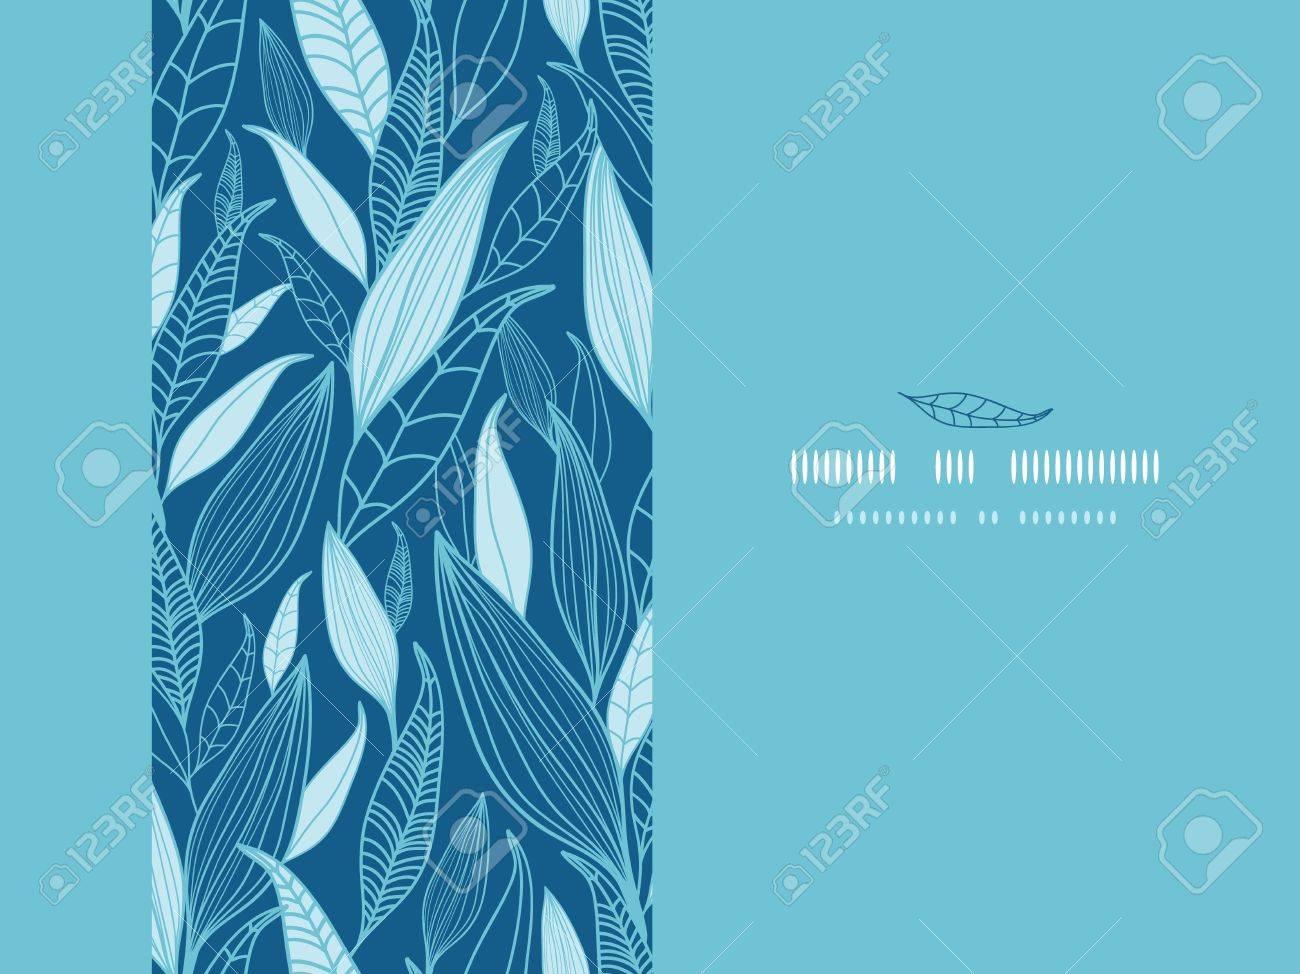 Blue Bamboo Leaves Horizontal Seamless Pattern Background - 18151034